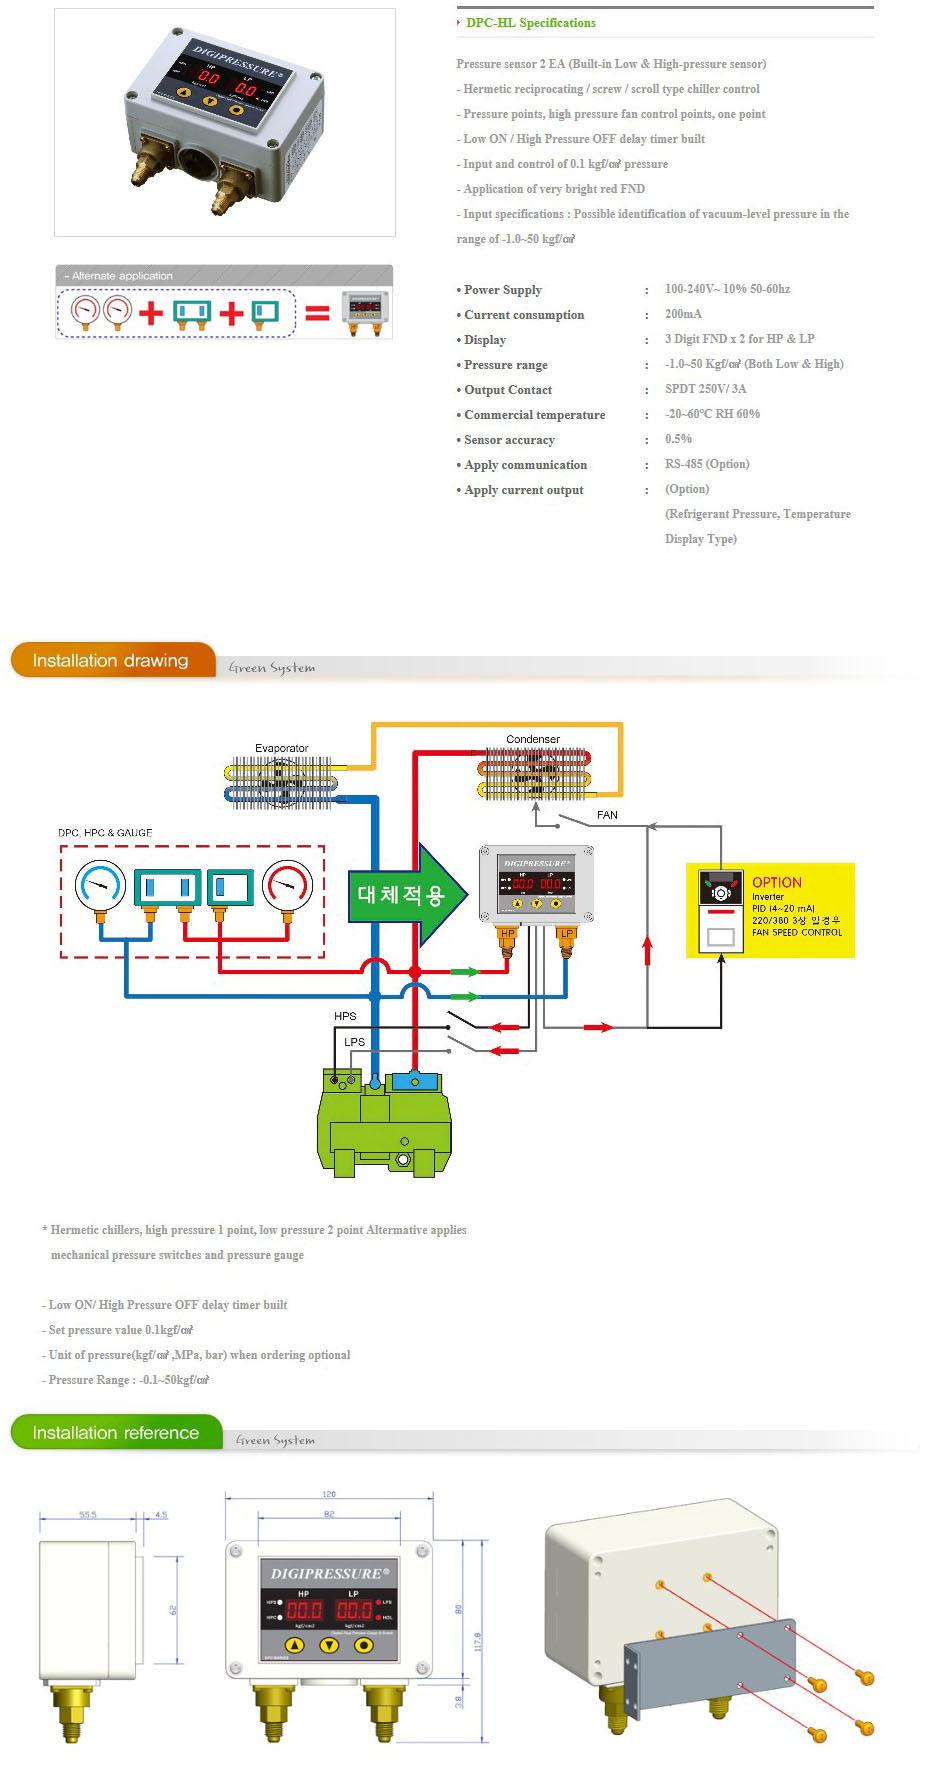 GREEN SYSTEM Digital Pressure DPC-HL